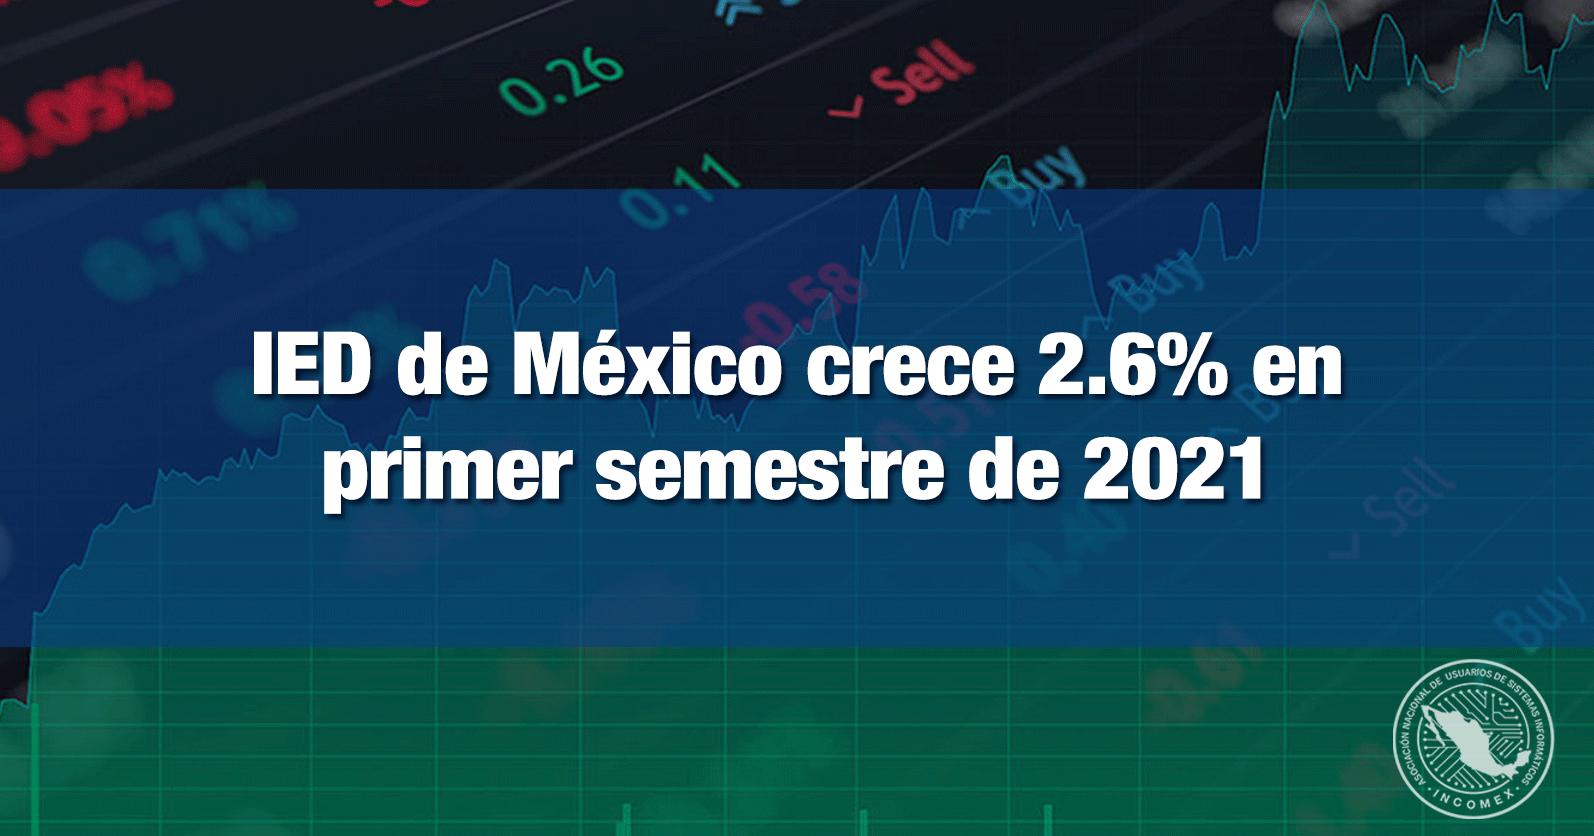 IED de México crece 2.6% en primer semestre de 2021